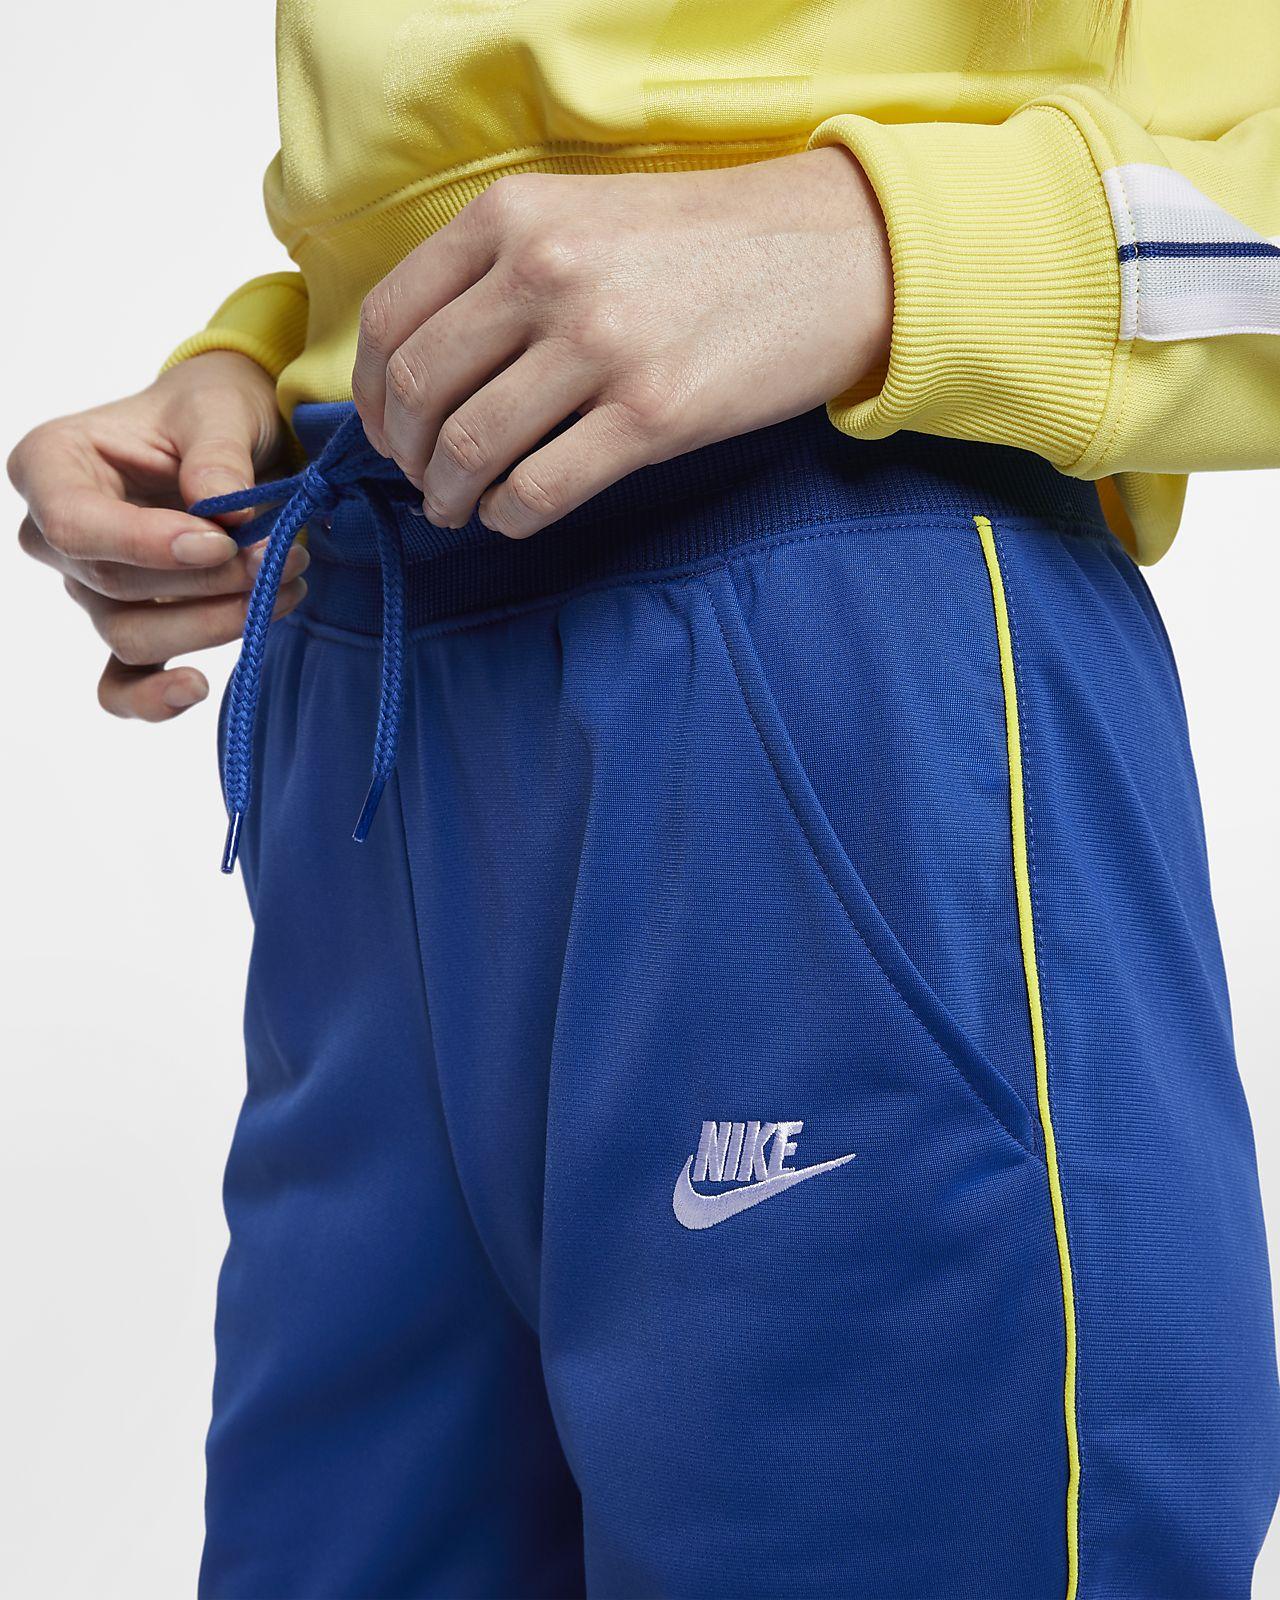 d23f719e9ec7e Pantalones de entrenamiento para mujer Nike Sportswear Heritage ...